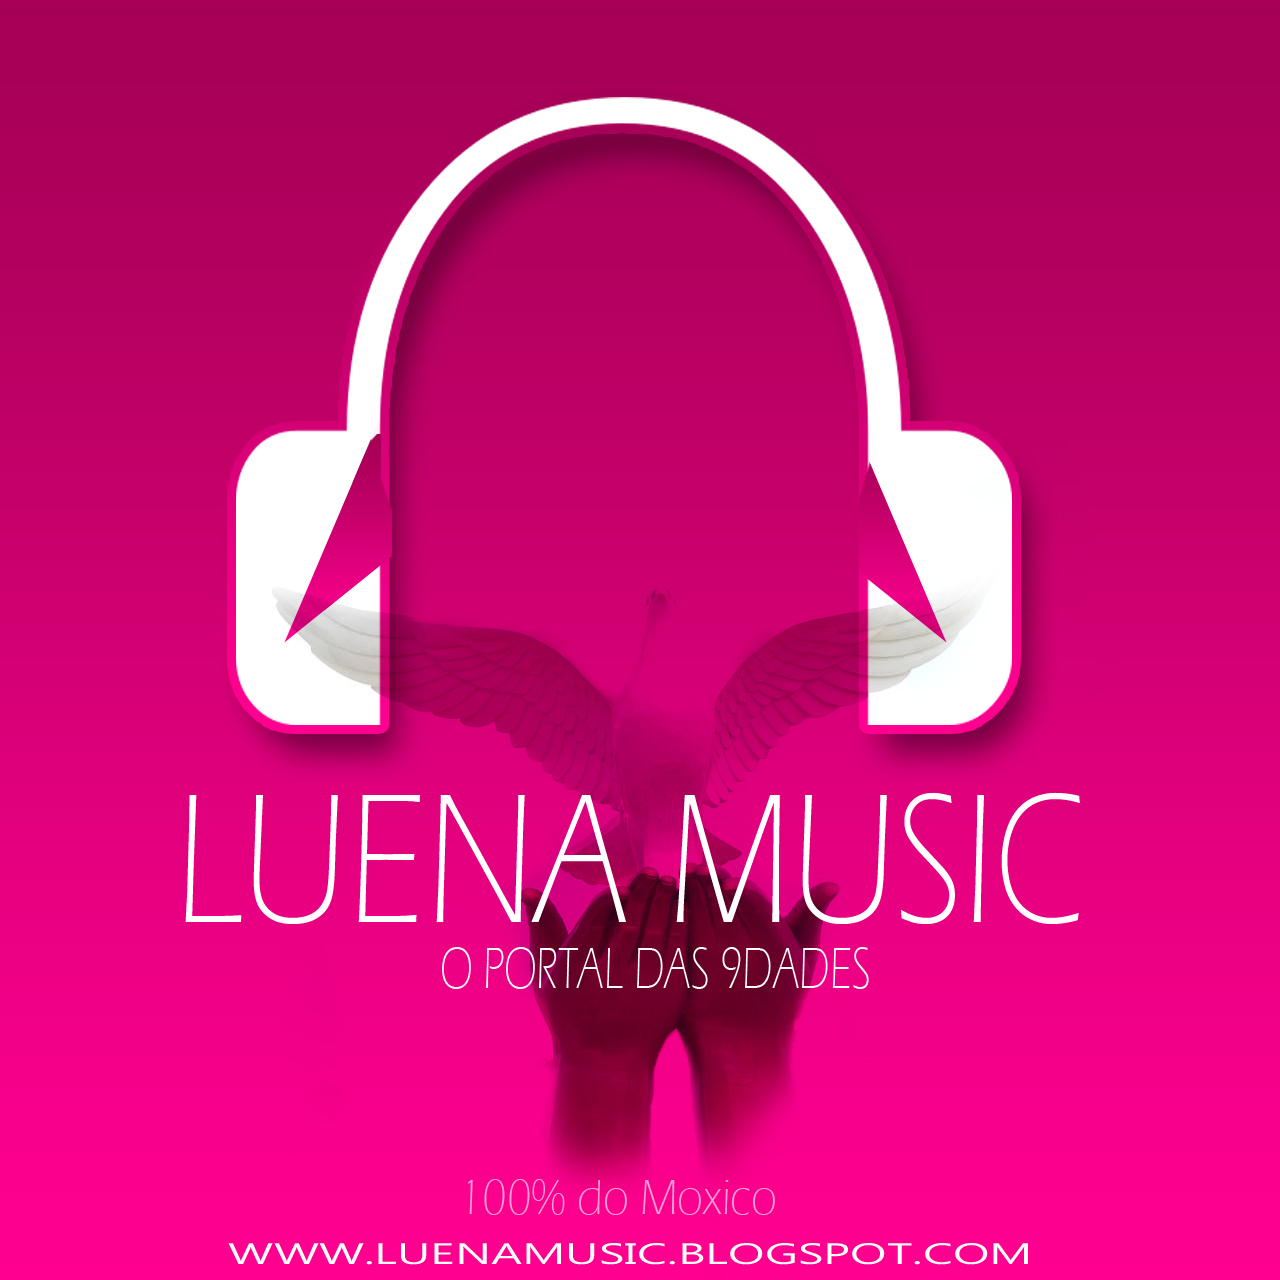 Luena Music